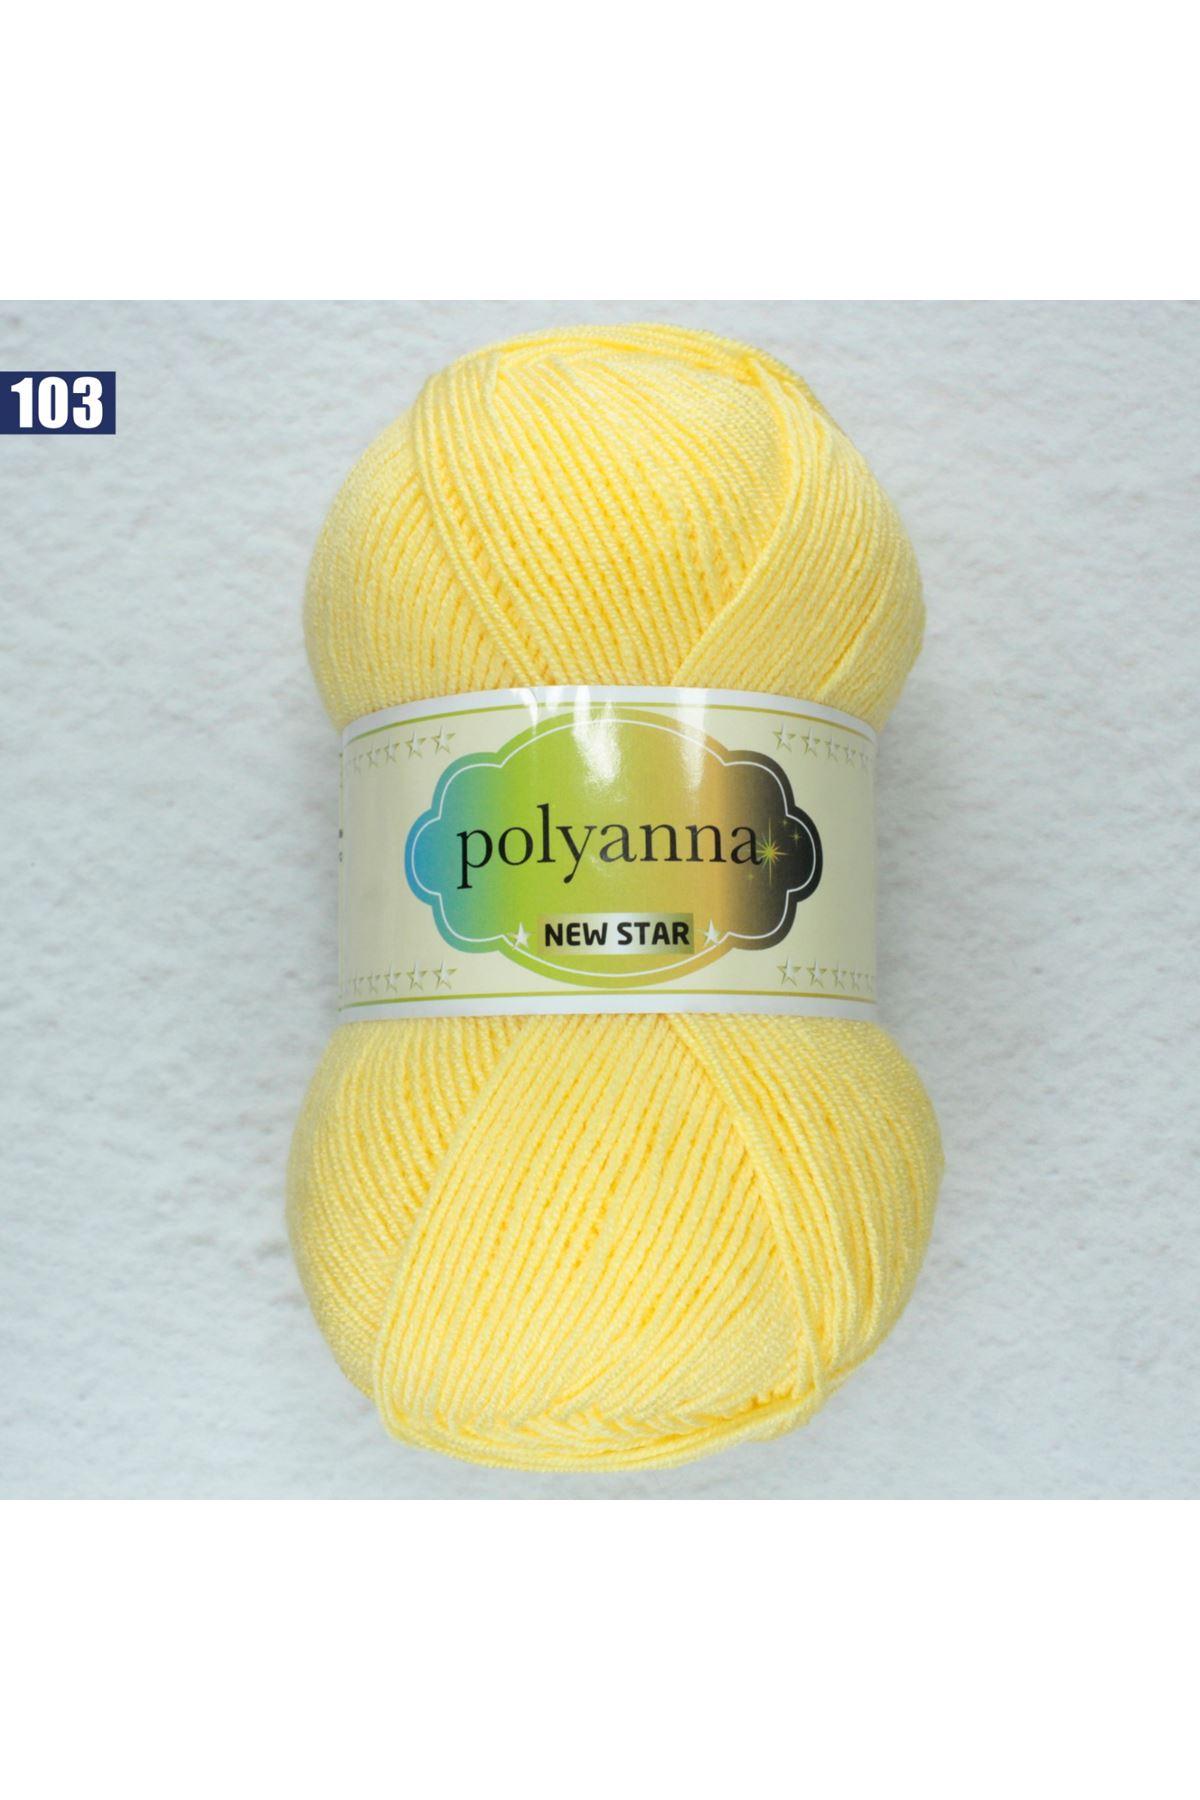 Polyanna New Star 103